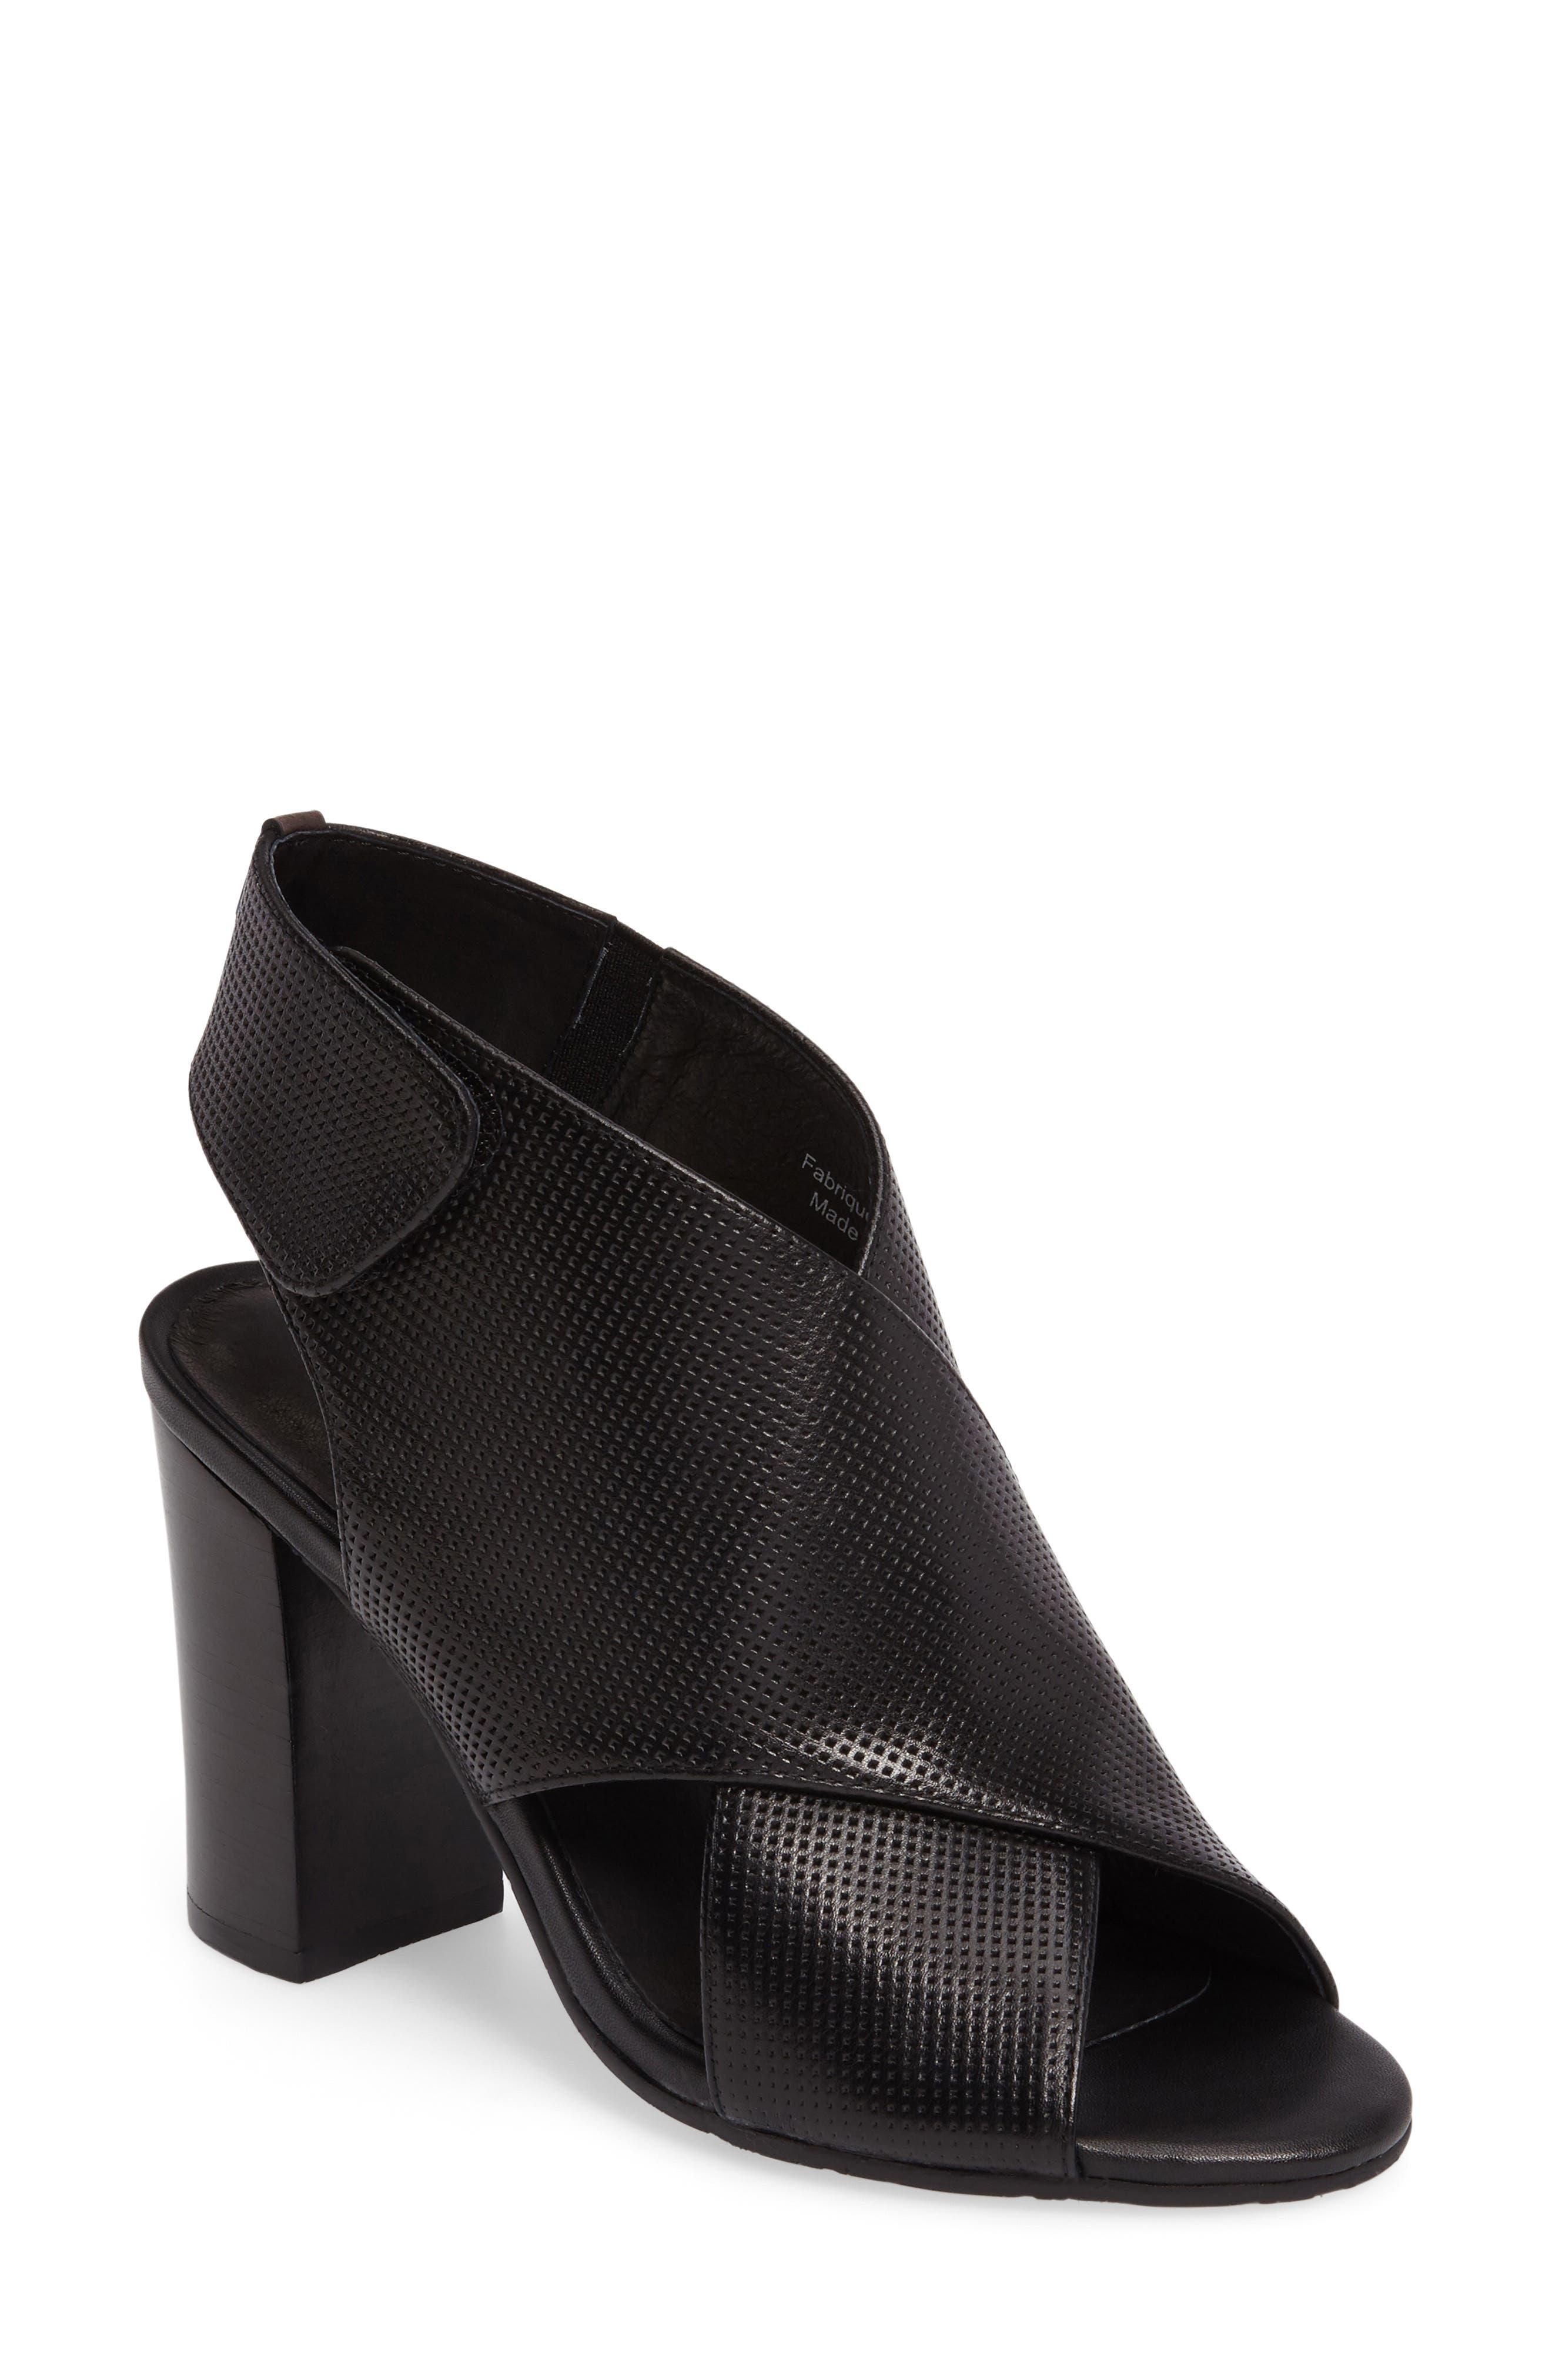 Benedetta Block Heel Sandal,                             Main thumbnail 1, color,                             001